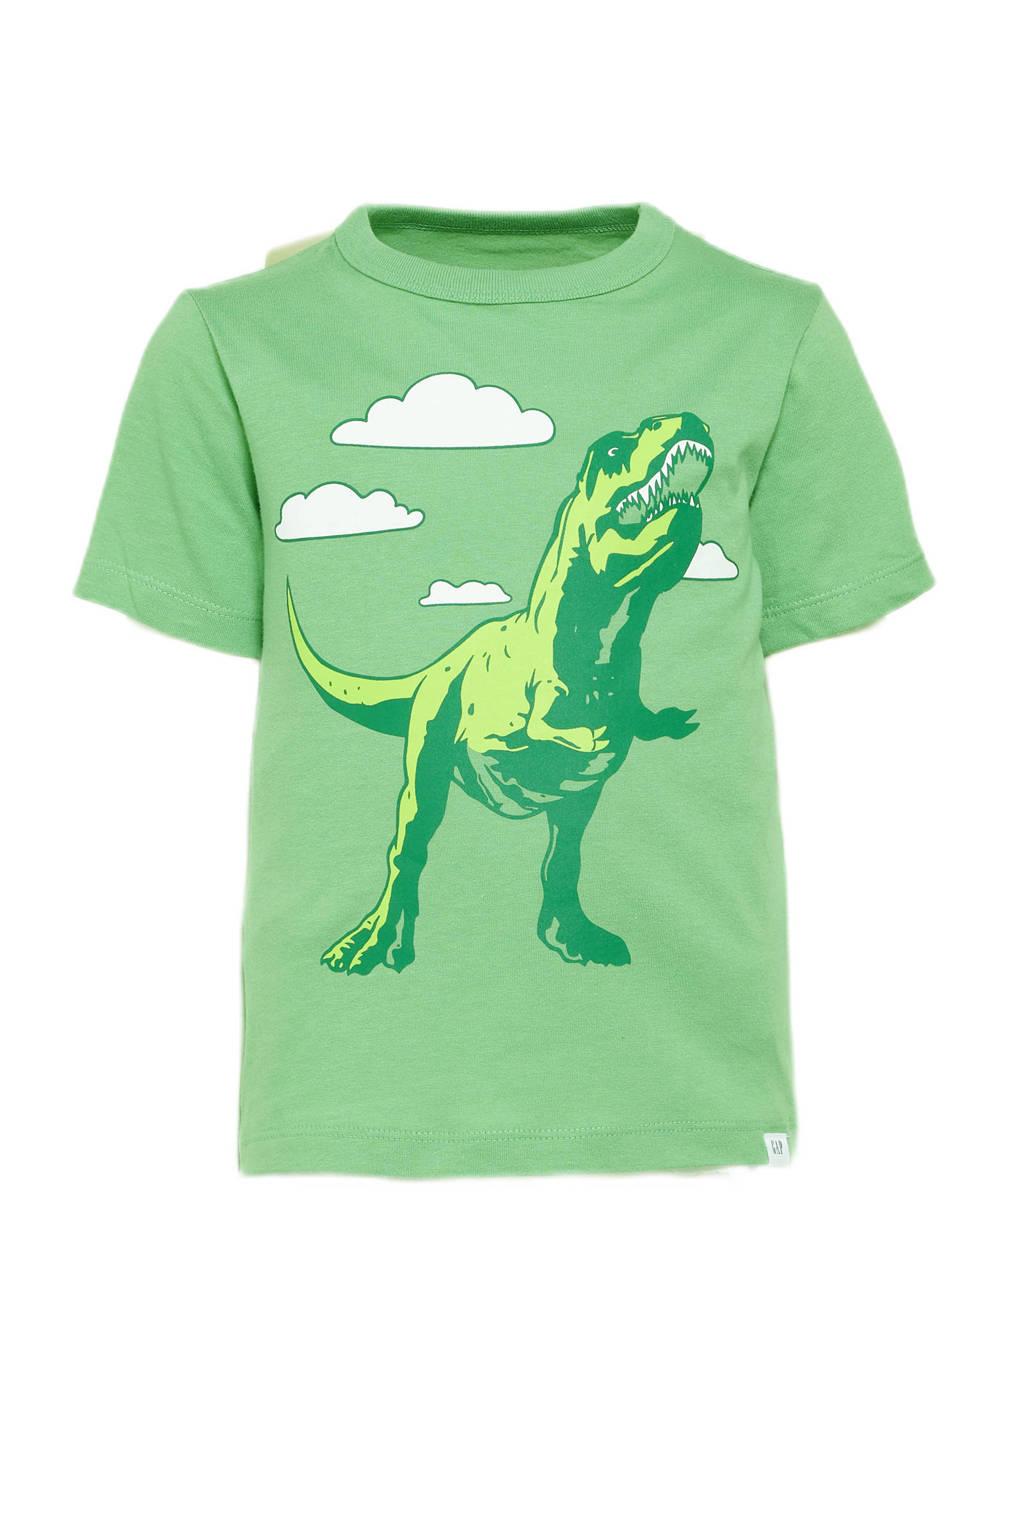 GAP T-shirt met printopdruk groen, Groen